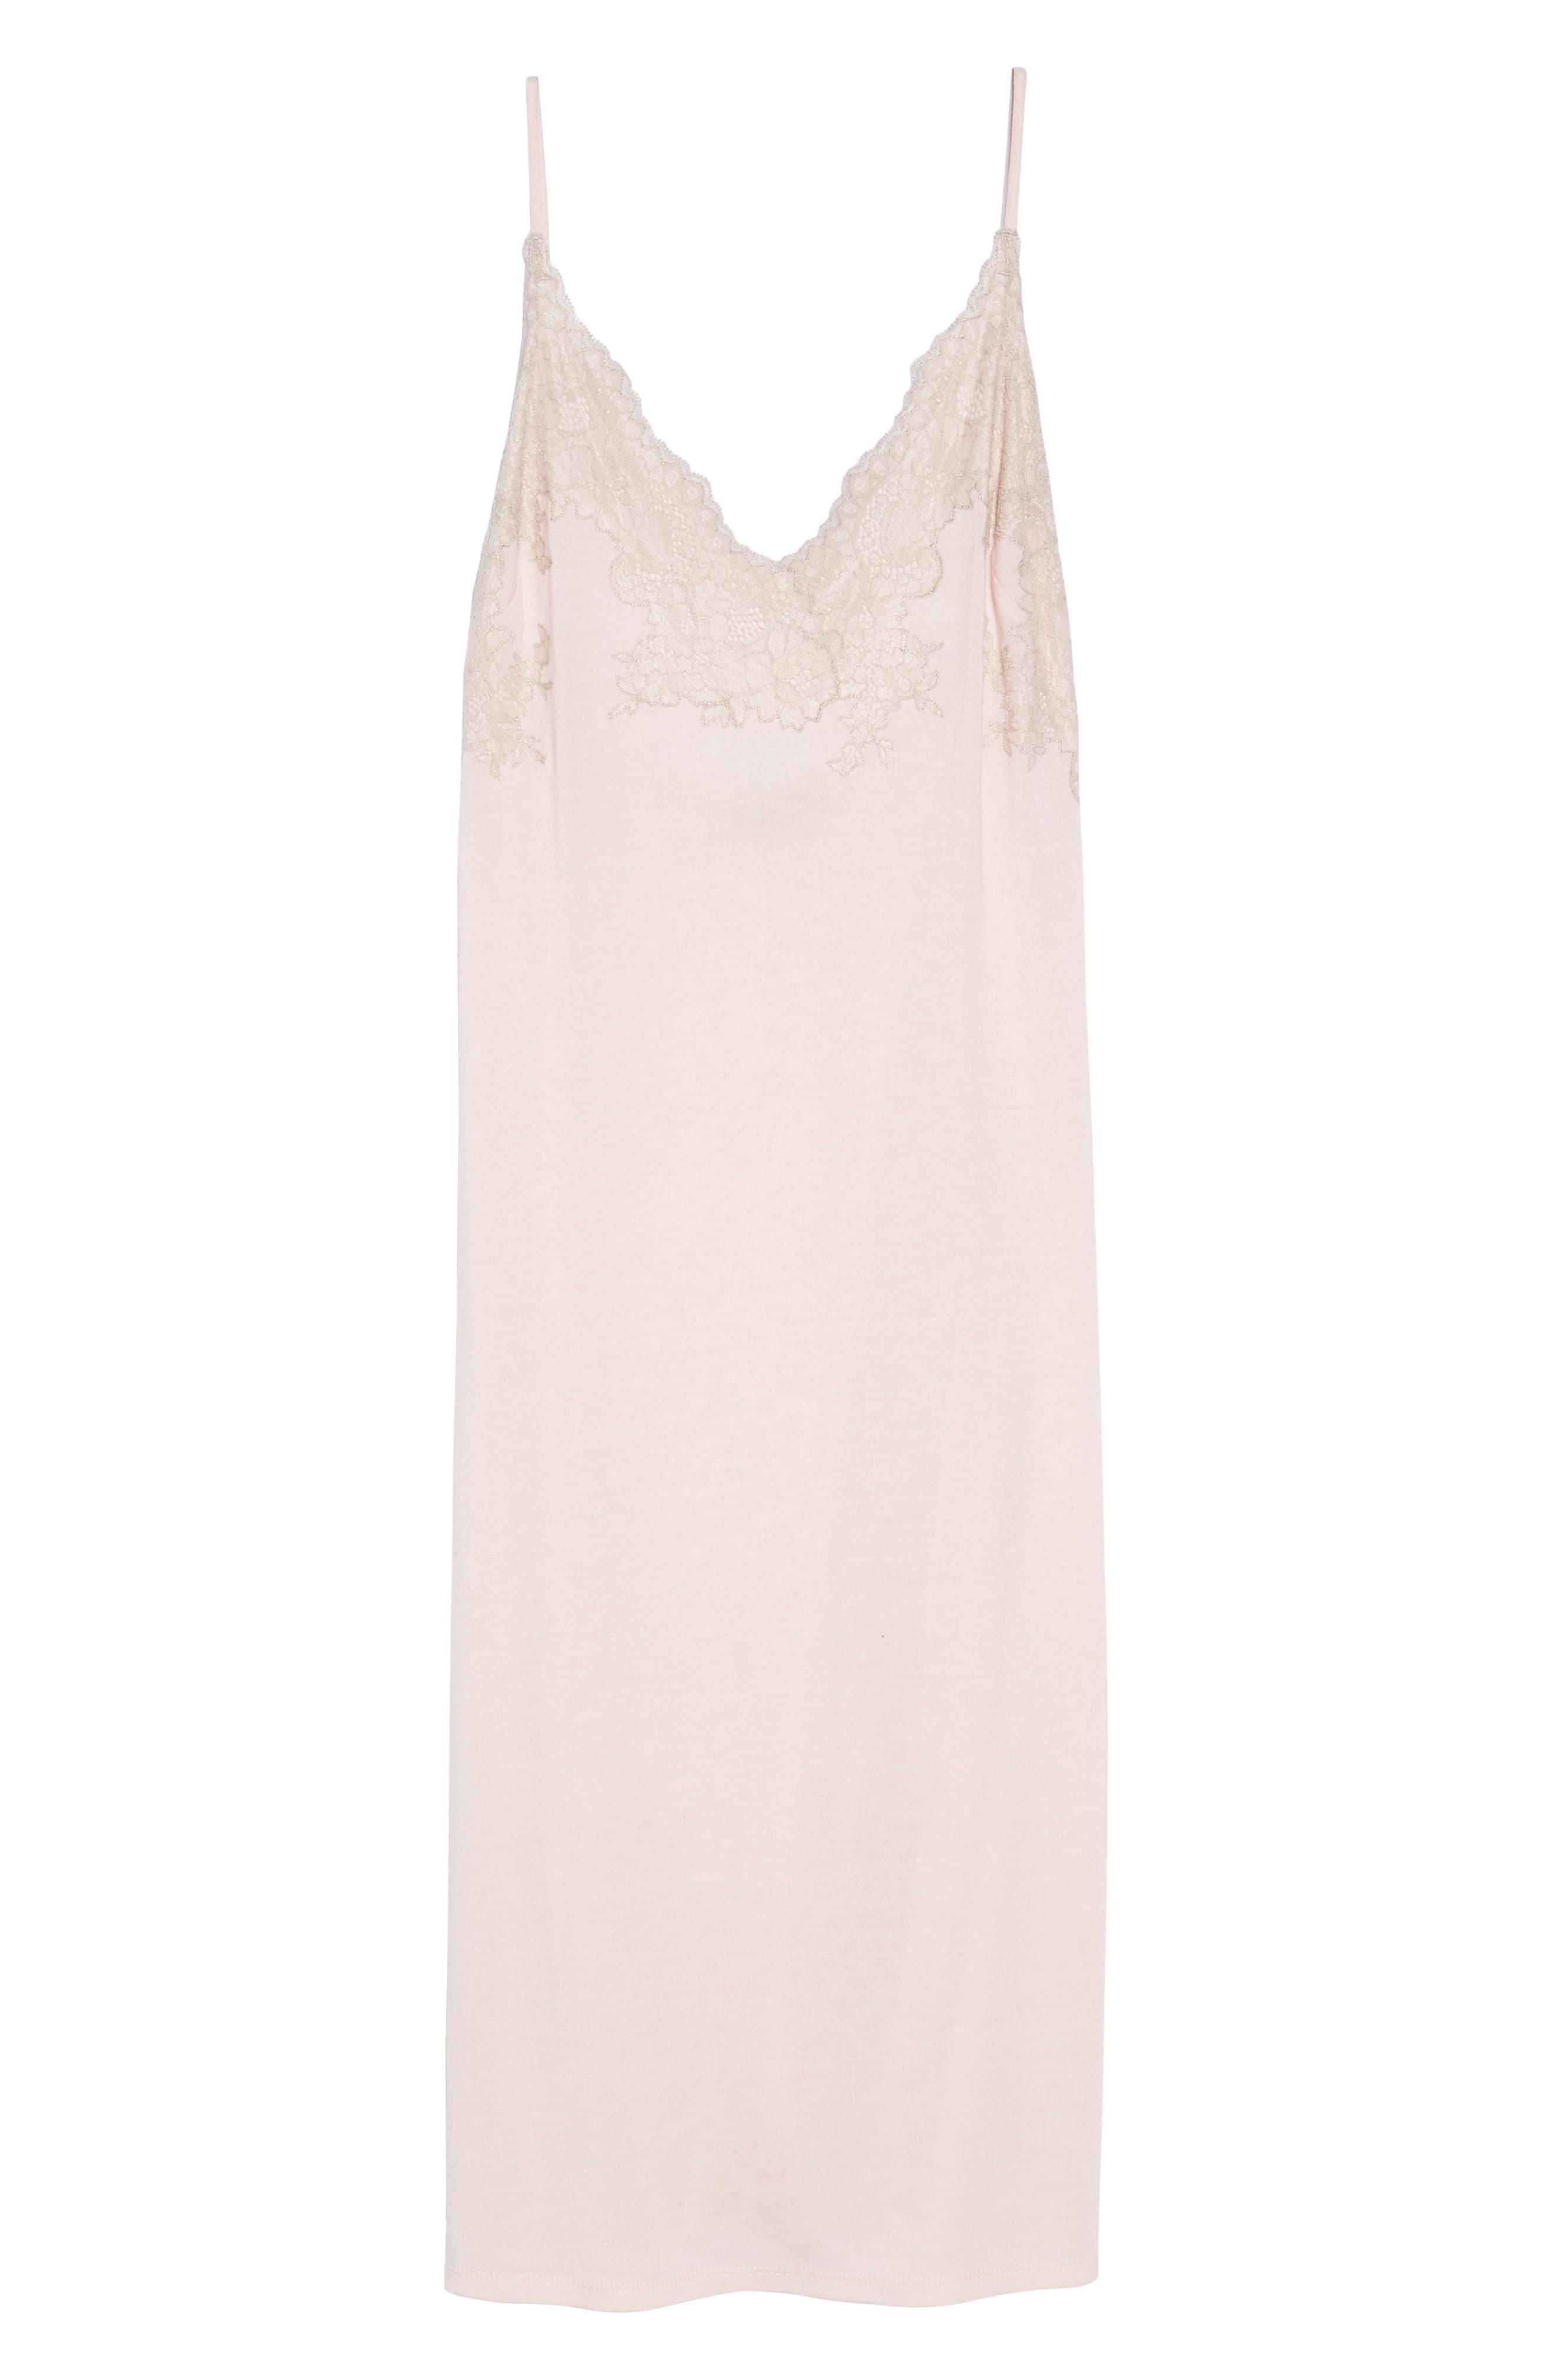 Luxe Shangri-La Nightgown,                             Alternate thumbnail 5, color,                             Blush Pink